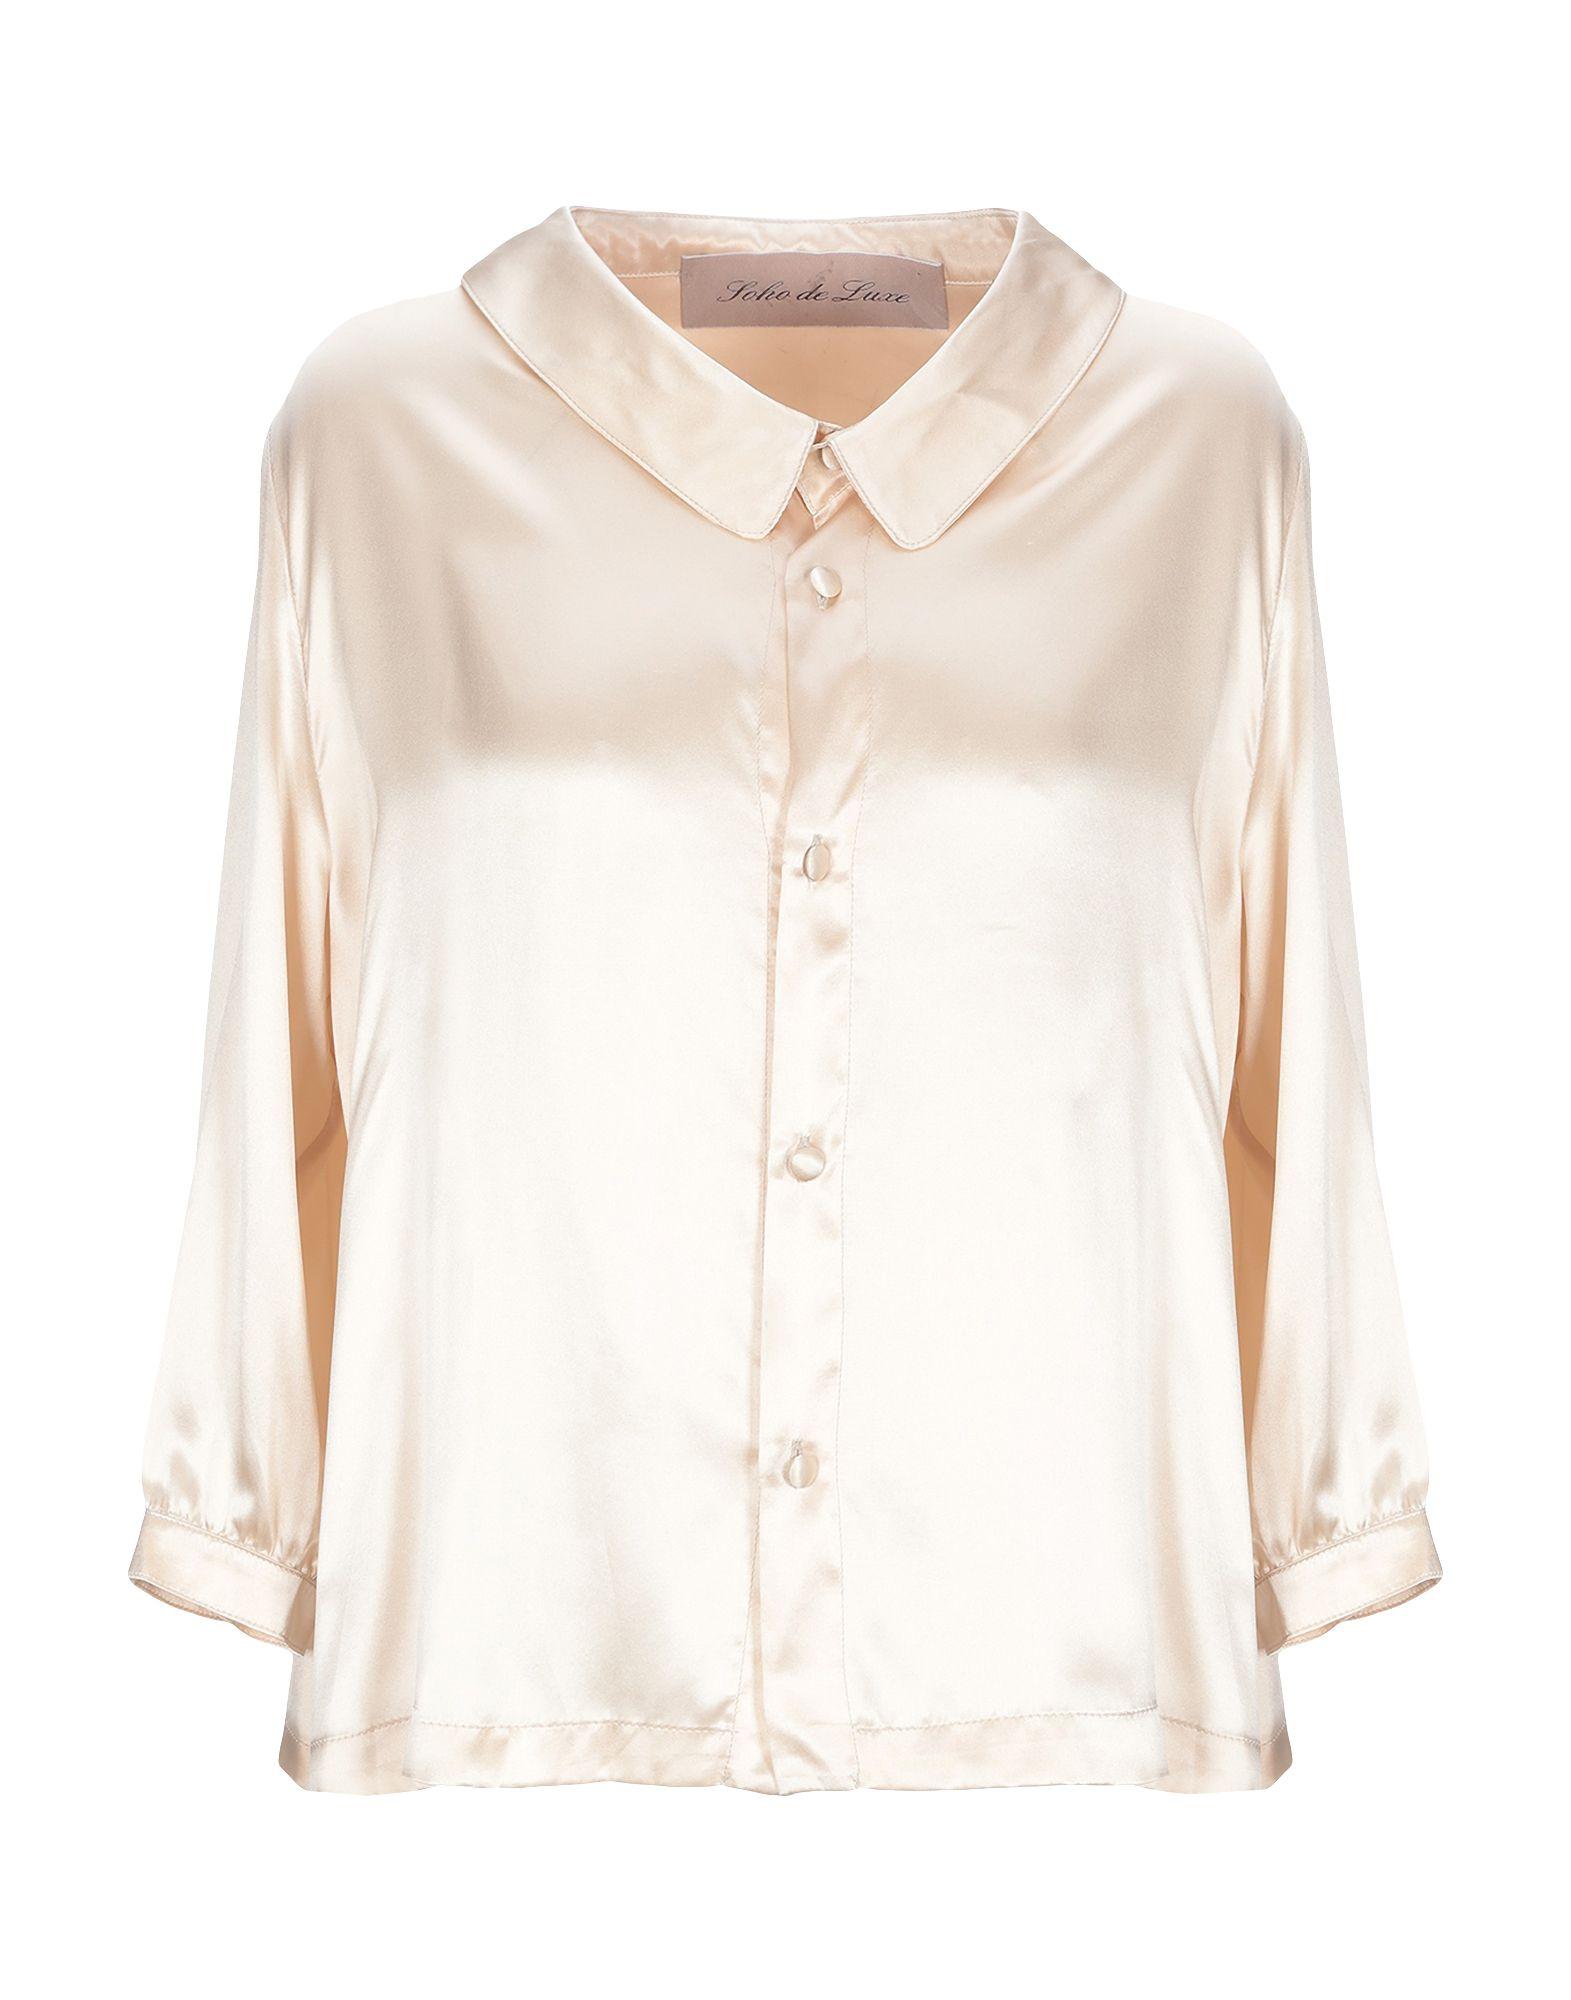 цена на SOHO DE LUXE Pубашка